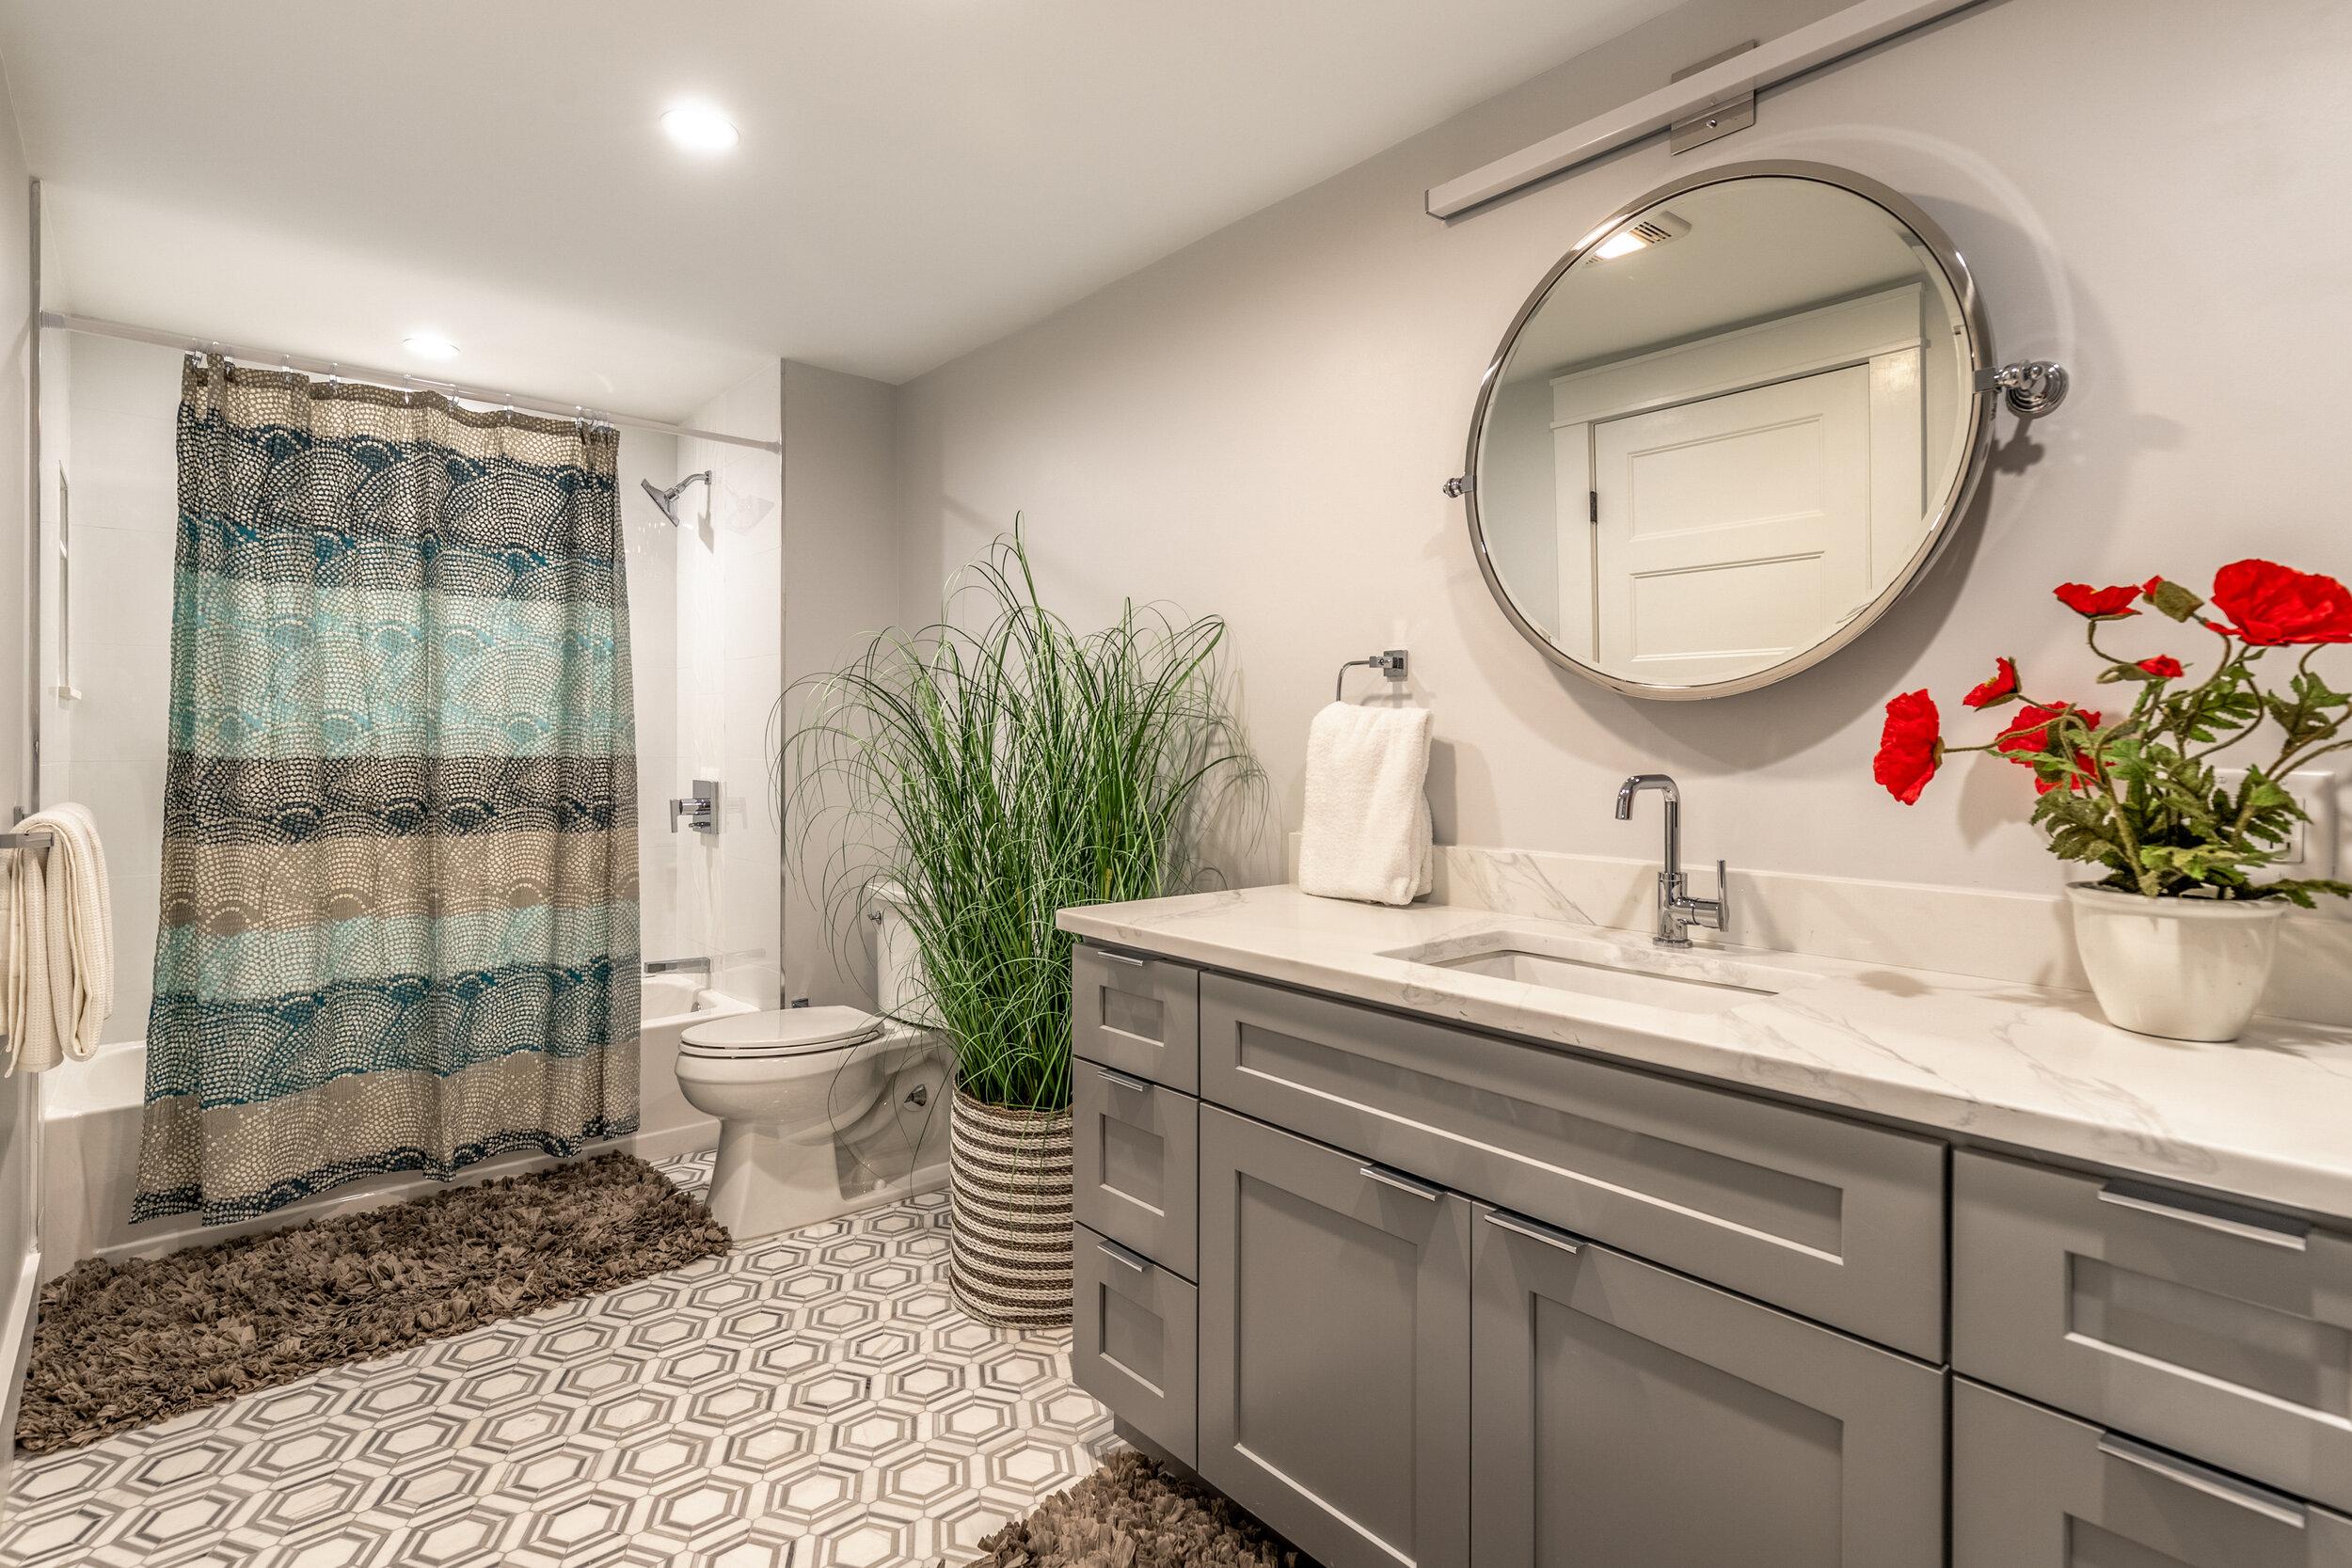 25_Bathroom-5.jpg